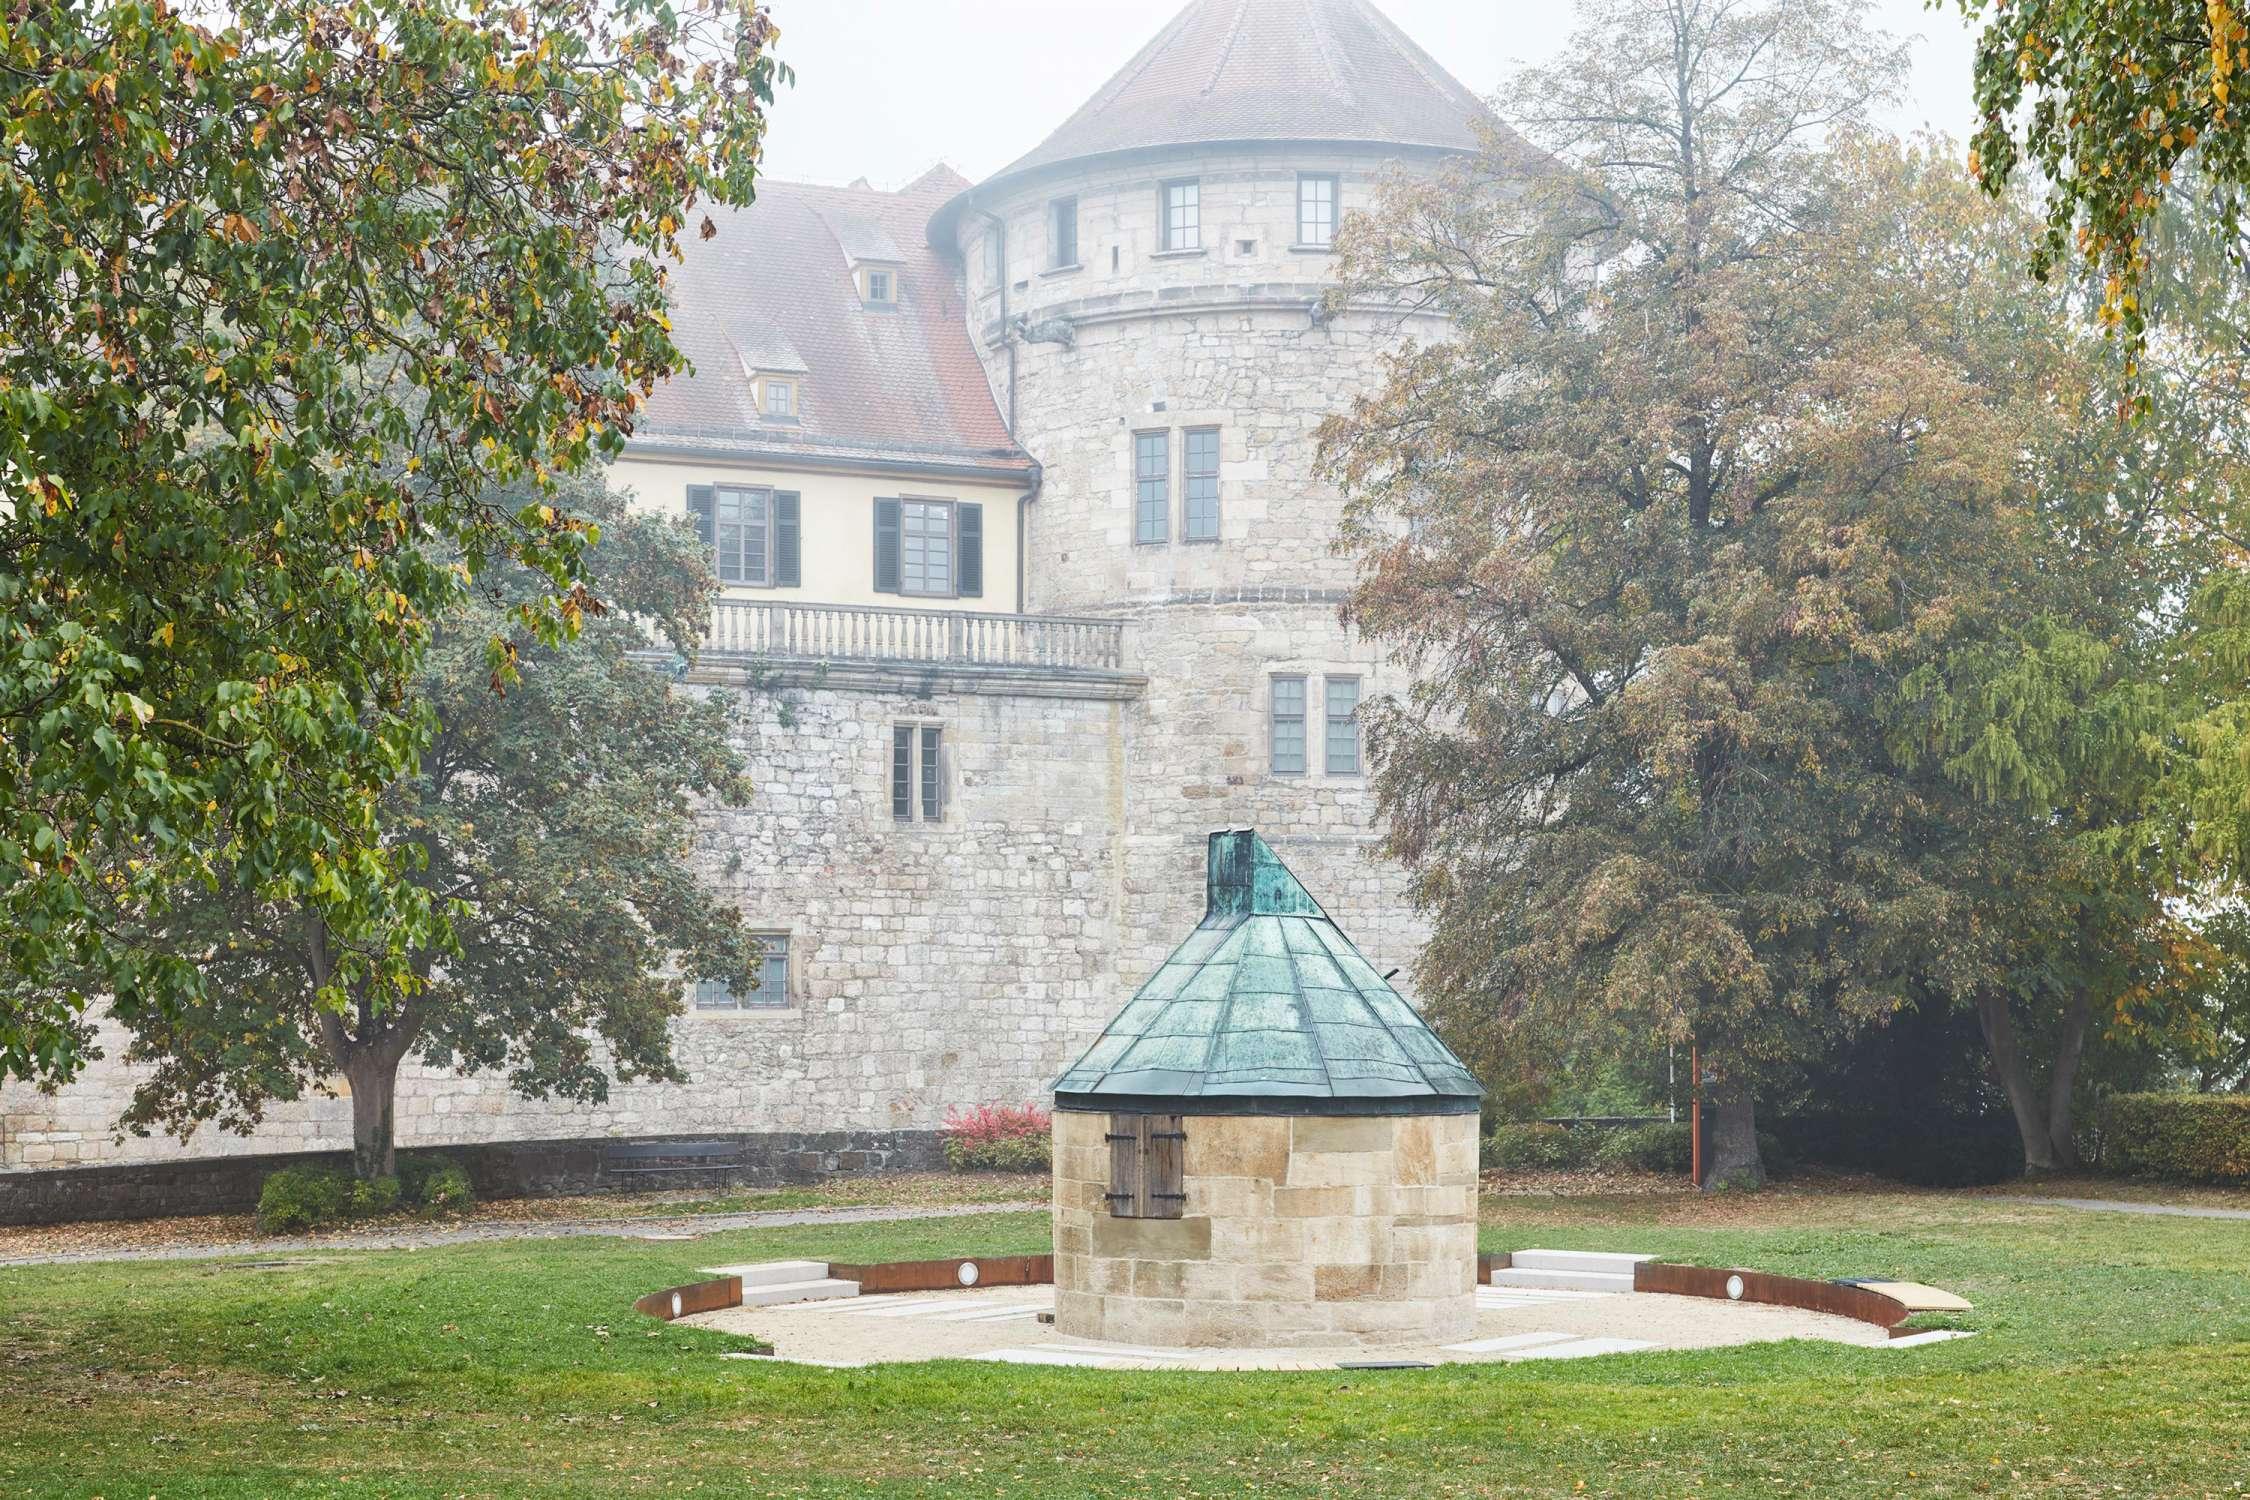 Johann Gottlieb Friedrich Bohnenberger Observatorium, Schloss Hohentübingen (6)